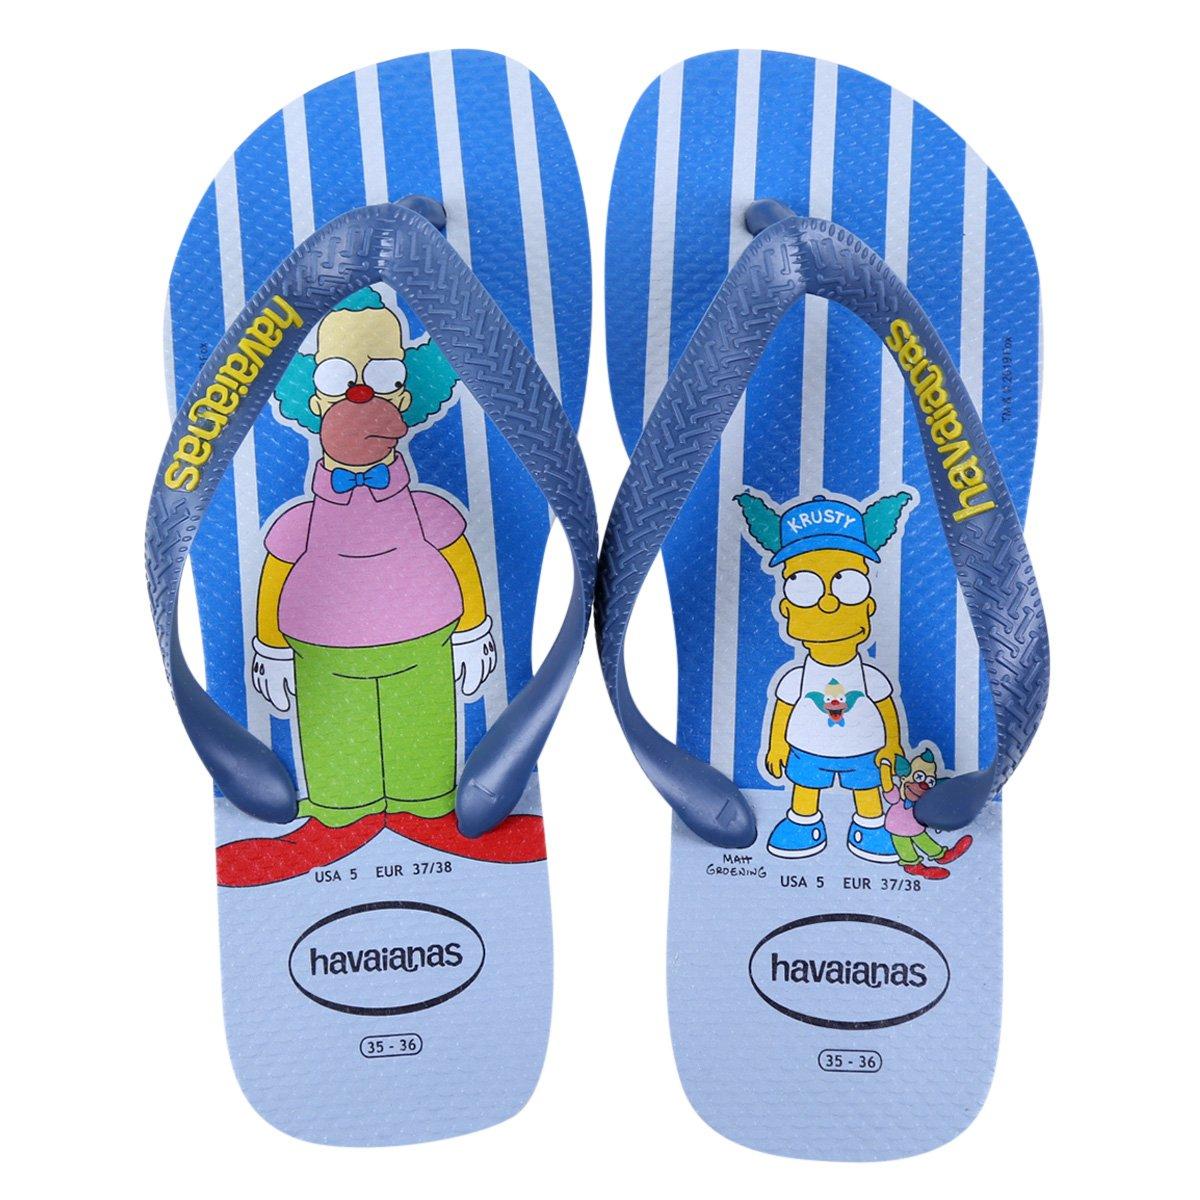 Chinelo Havaianas Estampado Os Simpsons